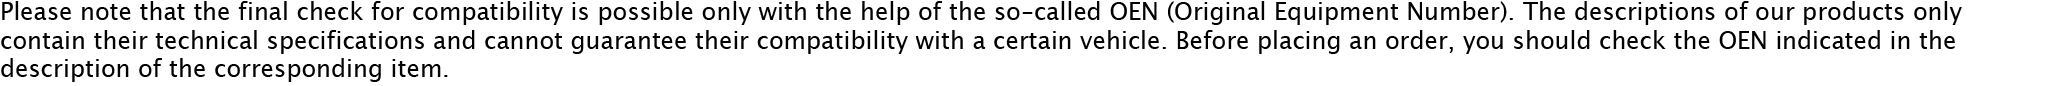 EPS 1 227 274, 1 406 051, 1 444 282, 1 805 255, 3S7T-15520-AA Switch, reverse light